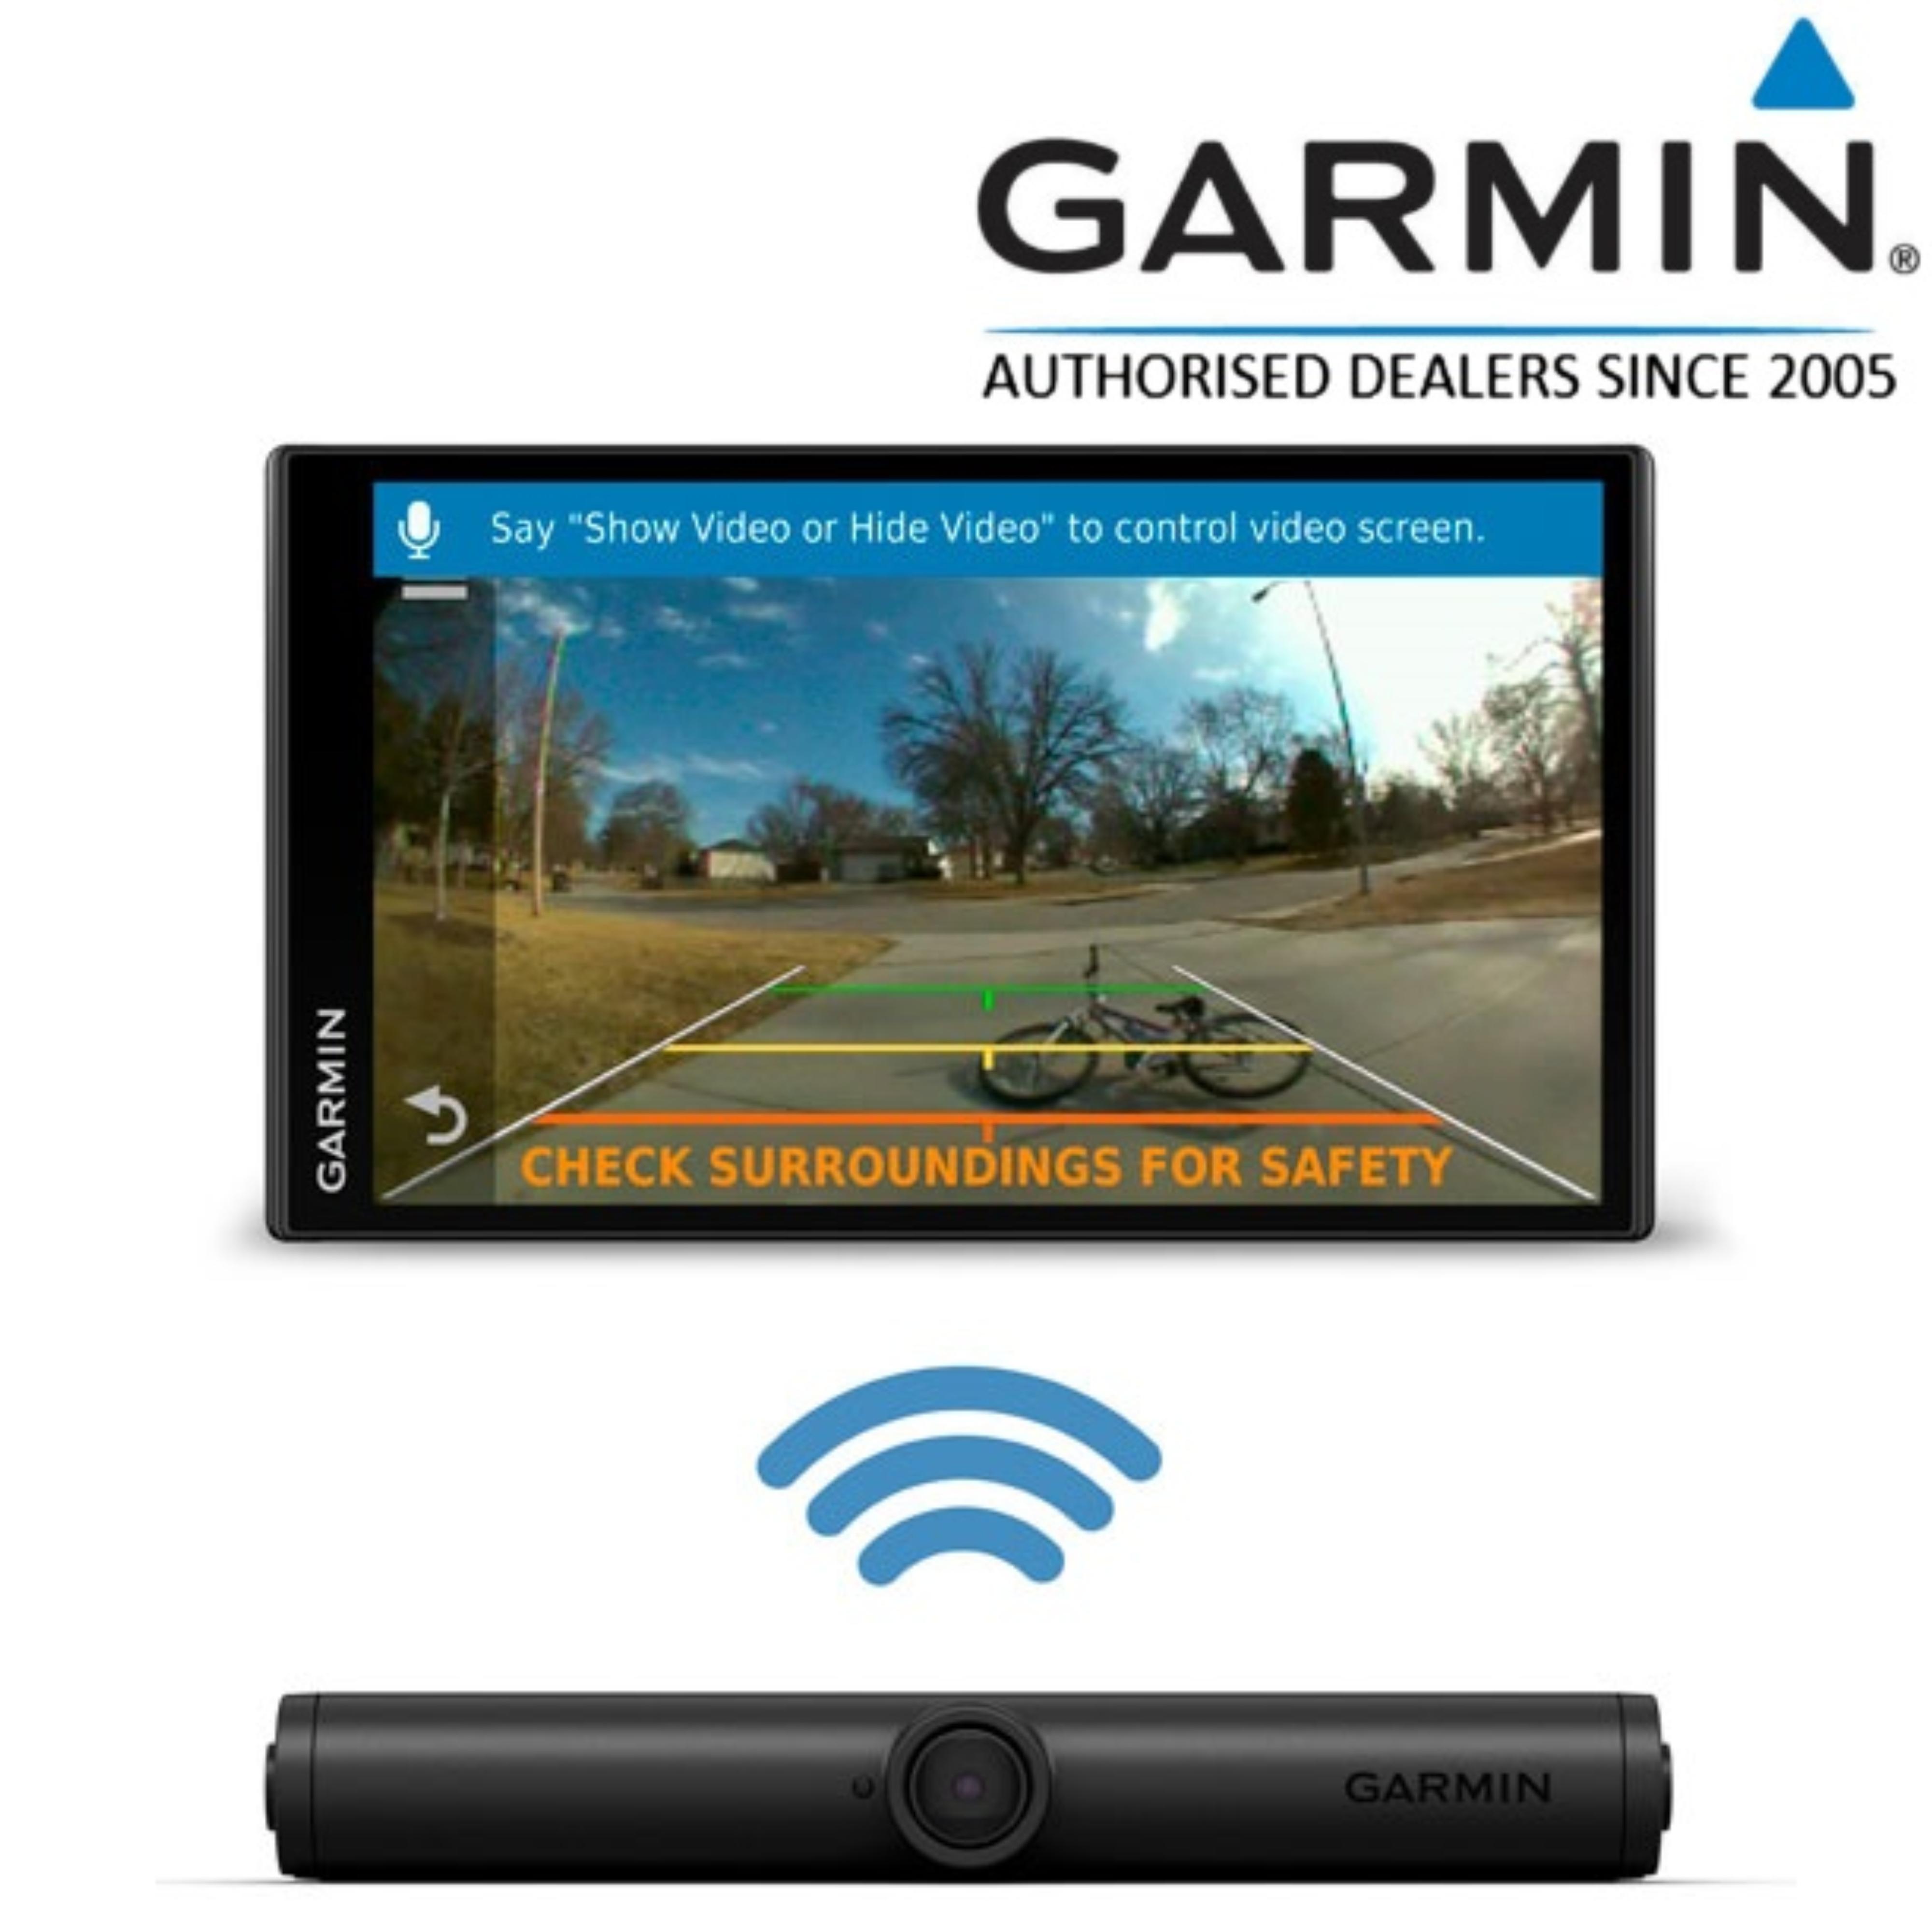 Garmin BC 40 Wireless Backup Camera | 720p | For DriveLuxe 51 LMT-S GPS Sat Nav | New